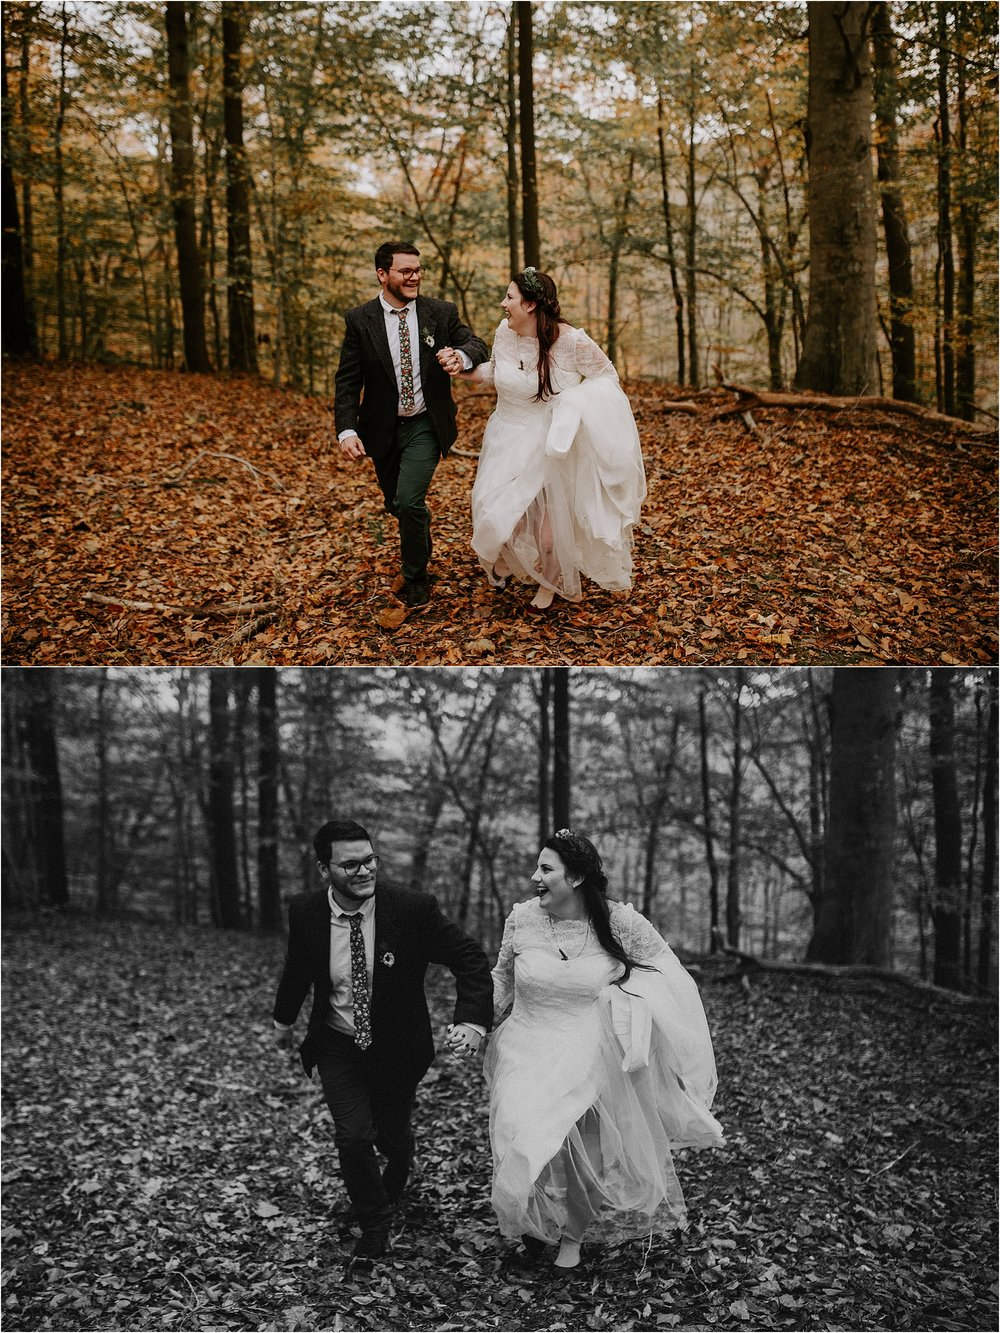 Sarah_Brookhart_Baltimore_Wedding_Photographer_0048.jpg